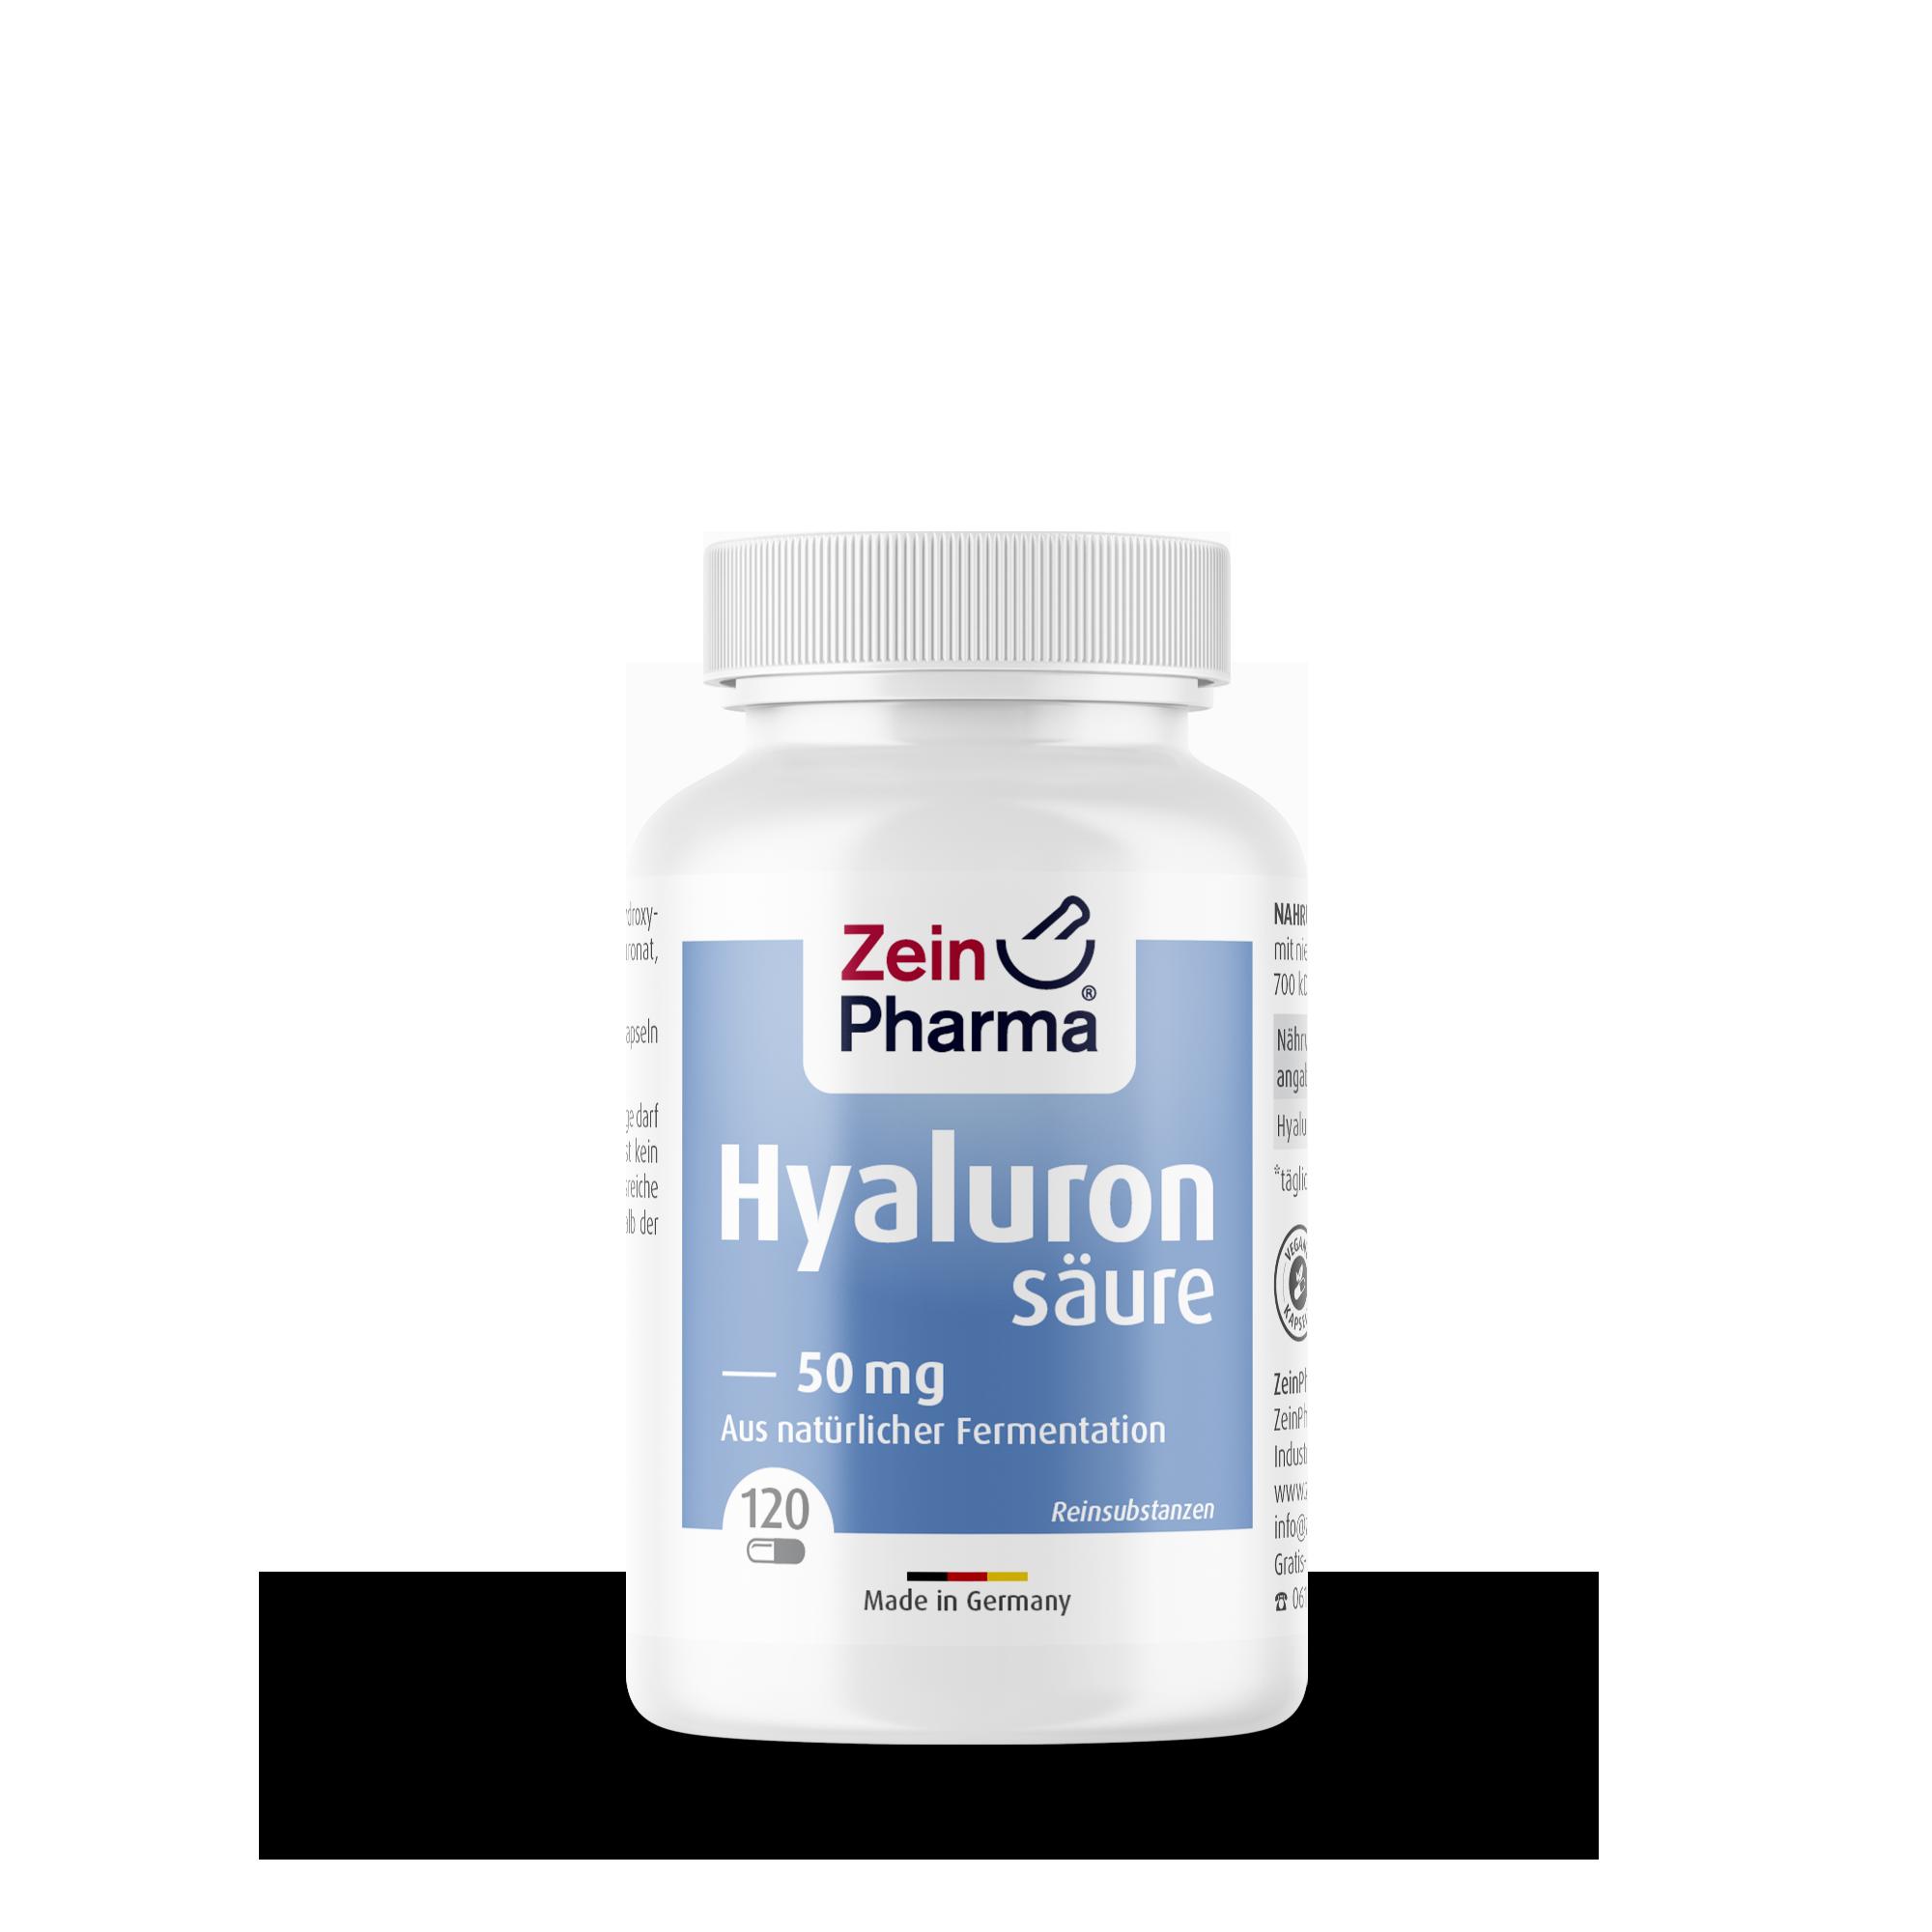 Hyaluronsäure 50 mg